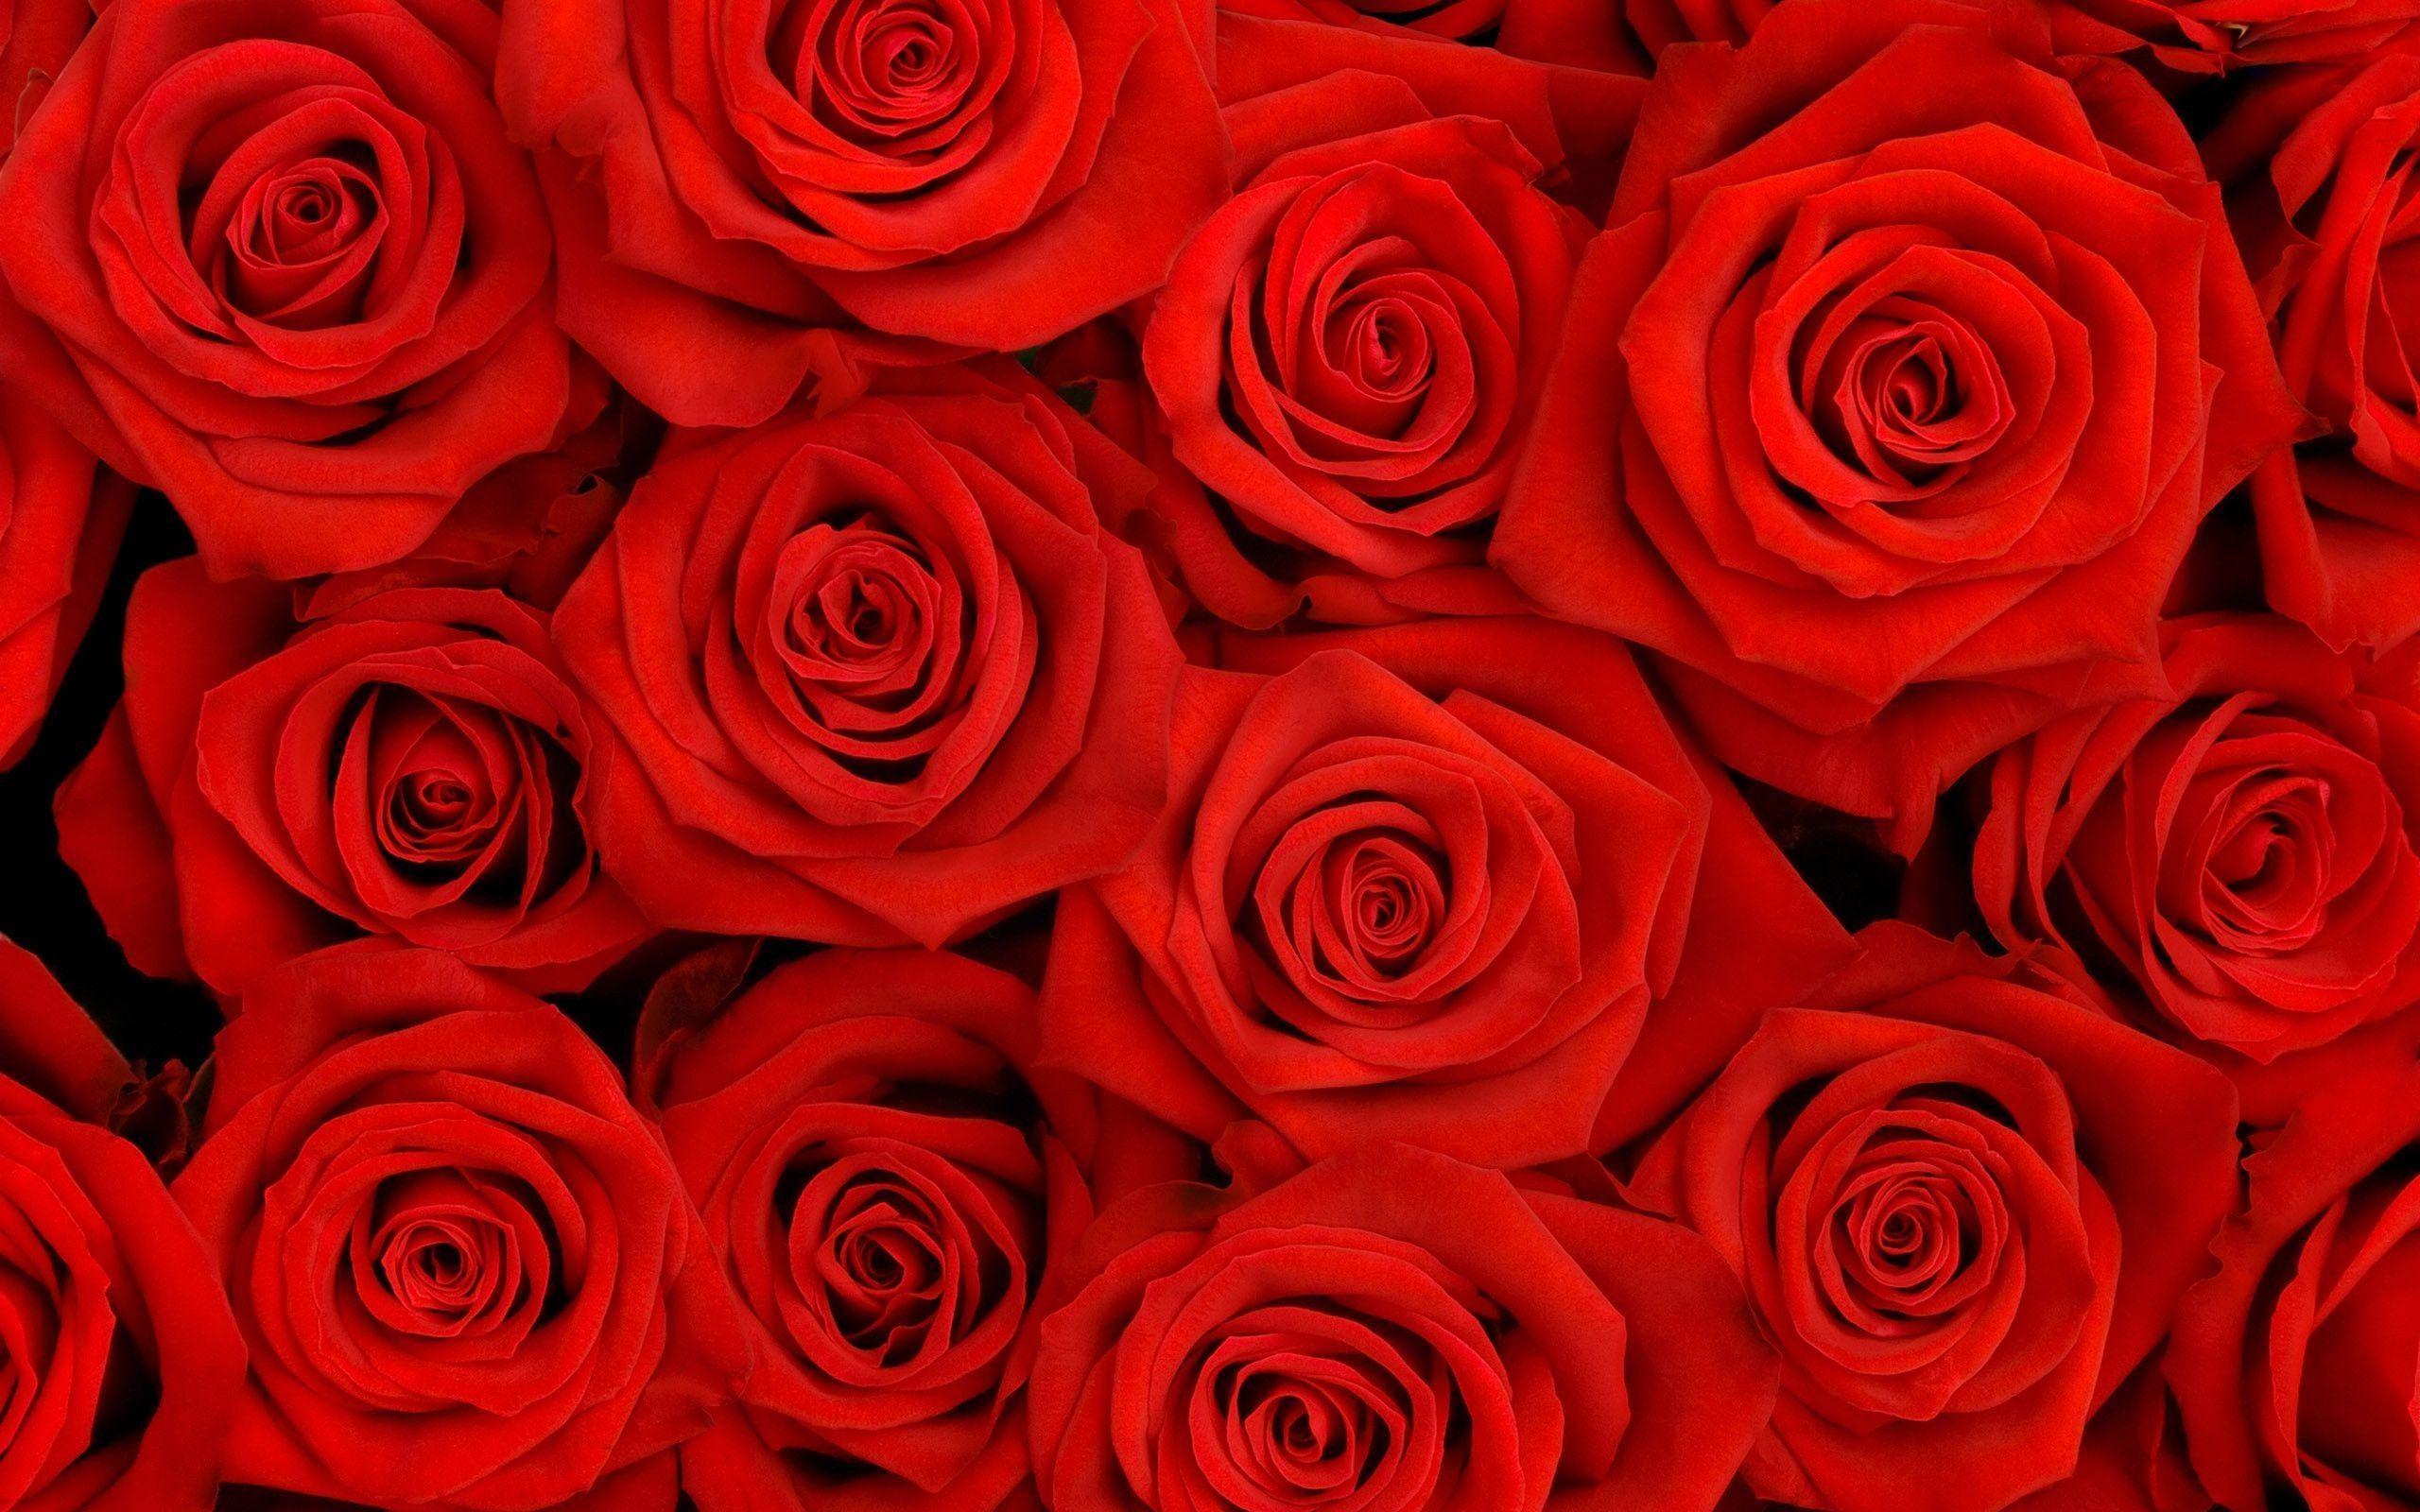 Res 2560x1600 Red Roses Wallpapers For Desktop Wallpaper Red Roses Wallpaper Red Roses Background Rose Flower Wallpaper